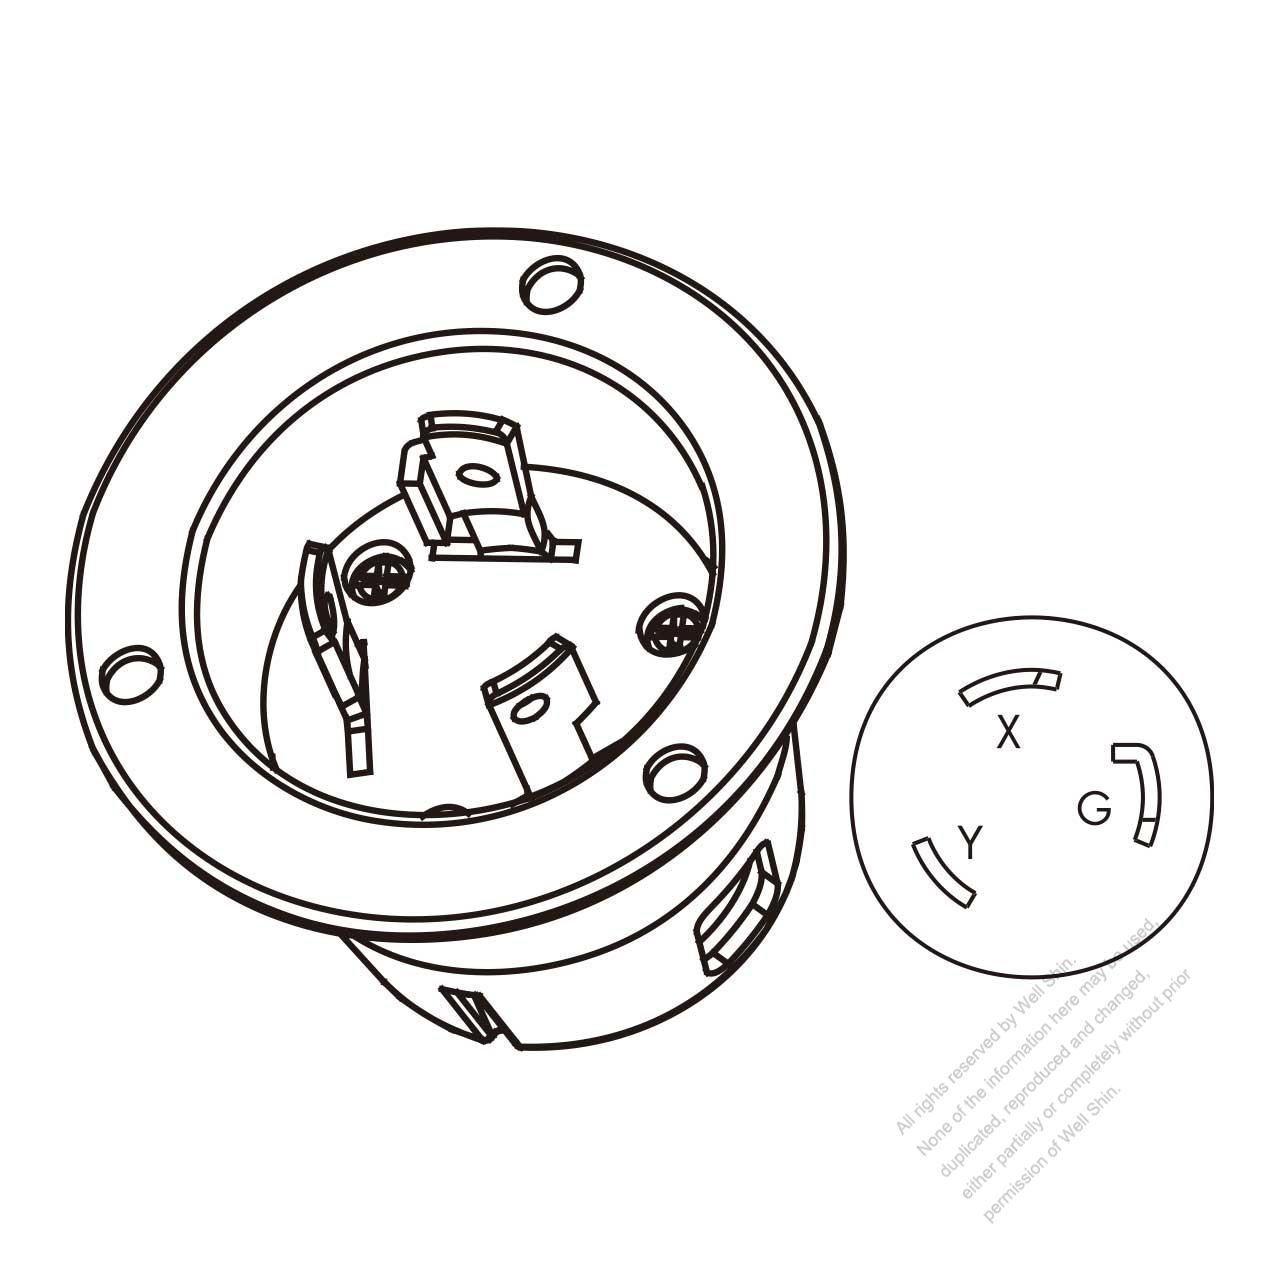 usa canada locking flanged inlet nema l6 30p 2 p 3 wire grounding L6-30P Label usa canada locking flanged inlet nema l6 30p 2 p 3 wire grounding